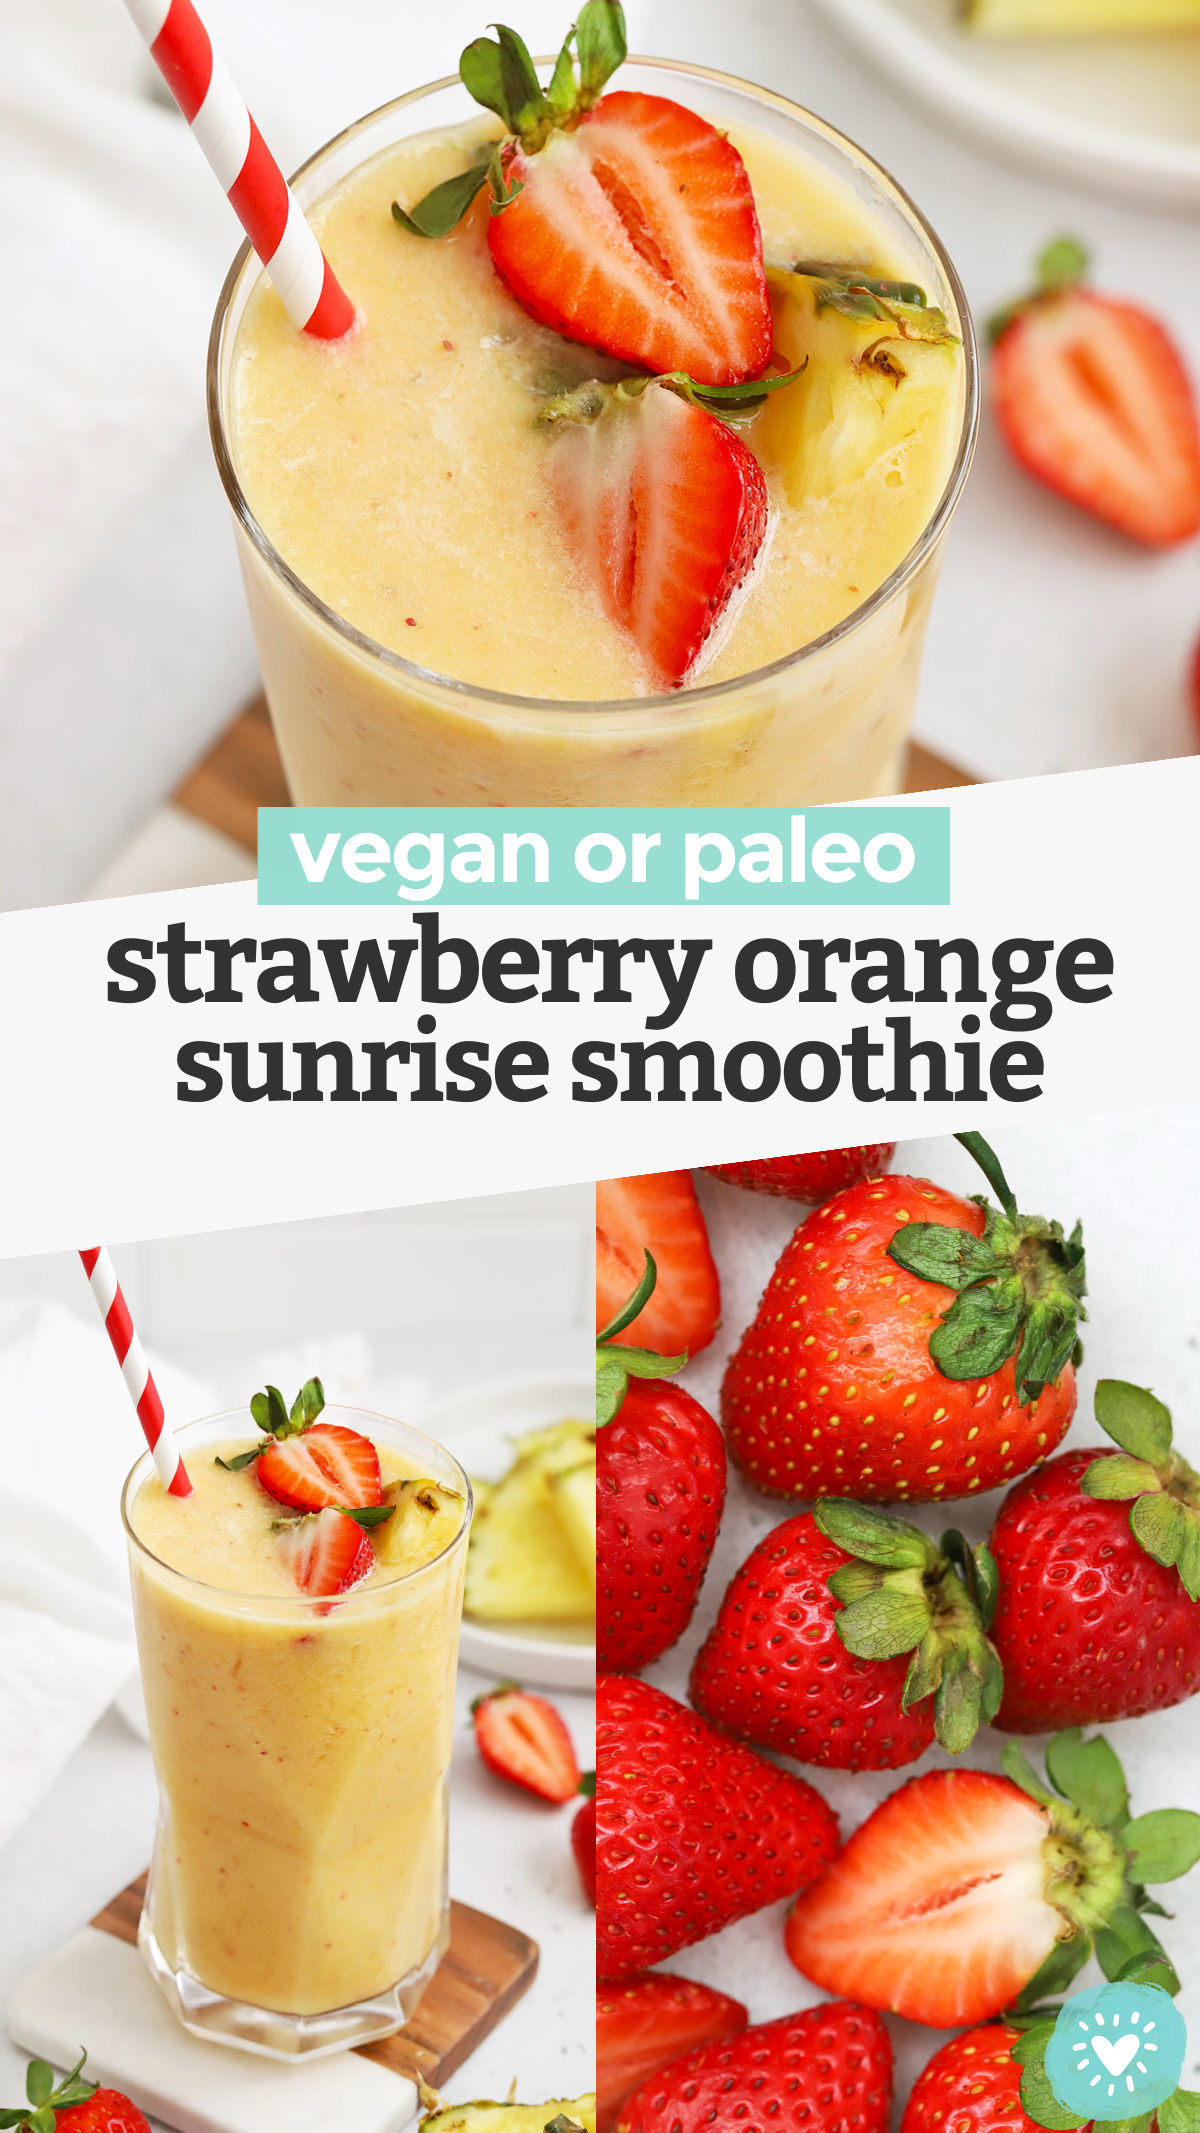 Strawberry Orange Sunrise Smoothie - This creamy strawberry mango pineapple smoothie has bright, fresh flavor that feels like taking your tastebuds on vacation! (Paleo or Vegan) // Strawberry Mango Smoothie // Strawberry Pineapple Smoothie // Strawberry Orange Smoothie // Healthy smoothie // healthy snack #paleo #vegan #smoothie